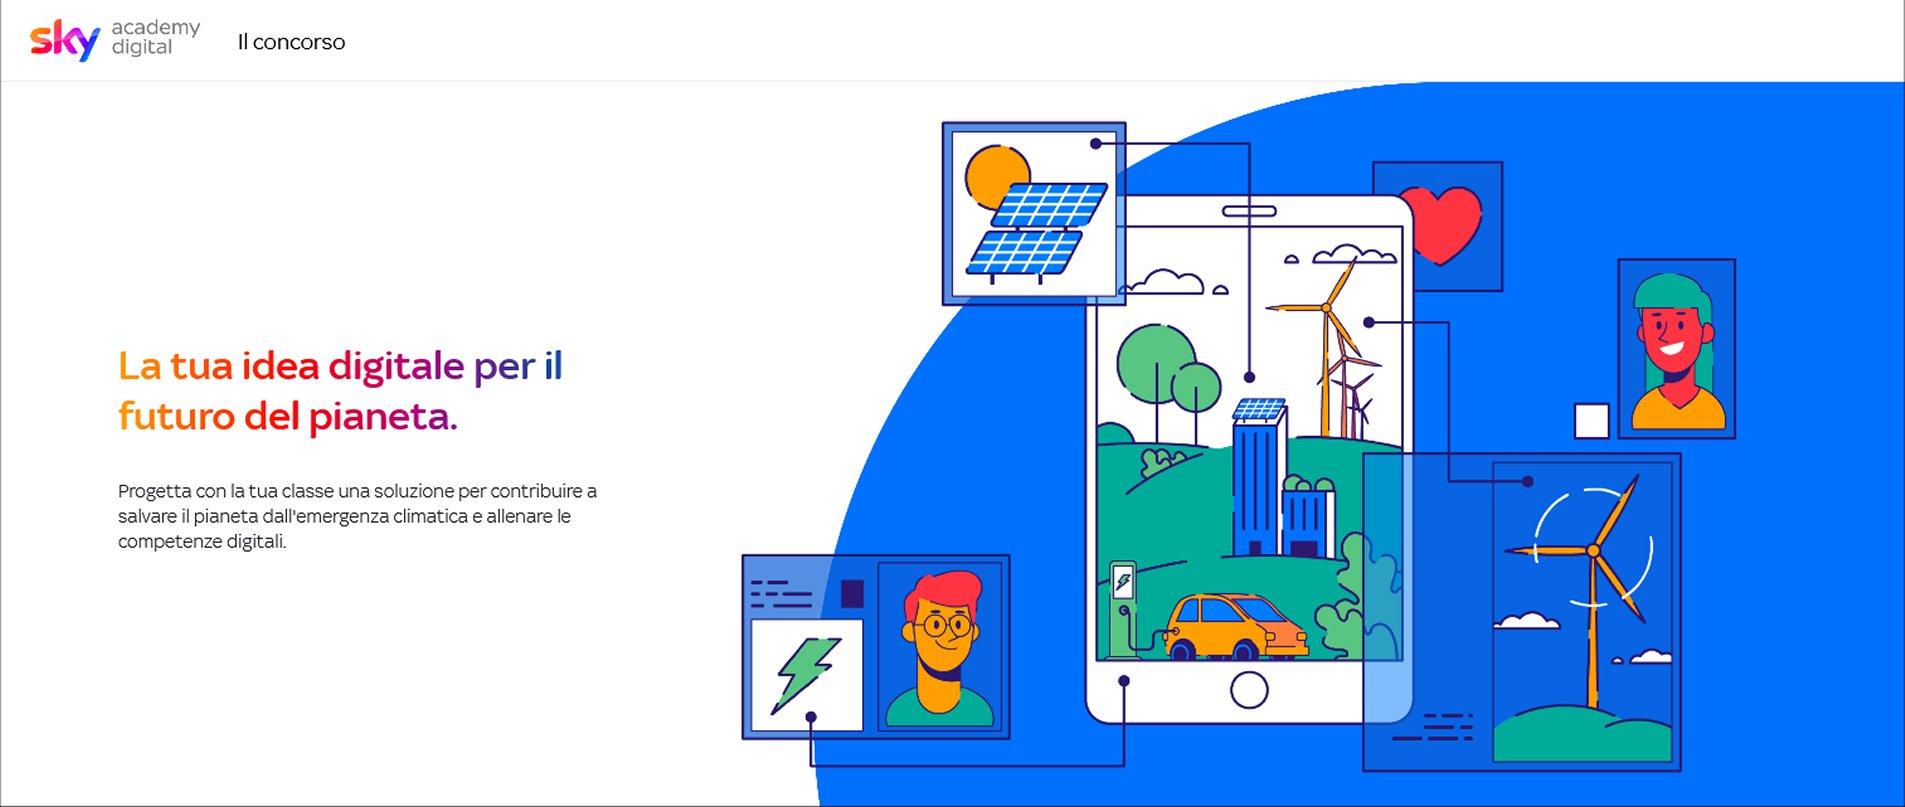 Sky Academy Digital rivolta agli studenti per competenze digitali ed emergenza climatica